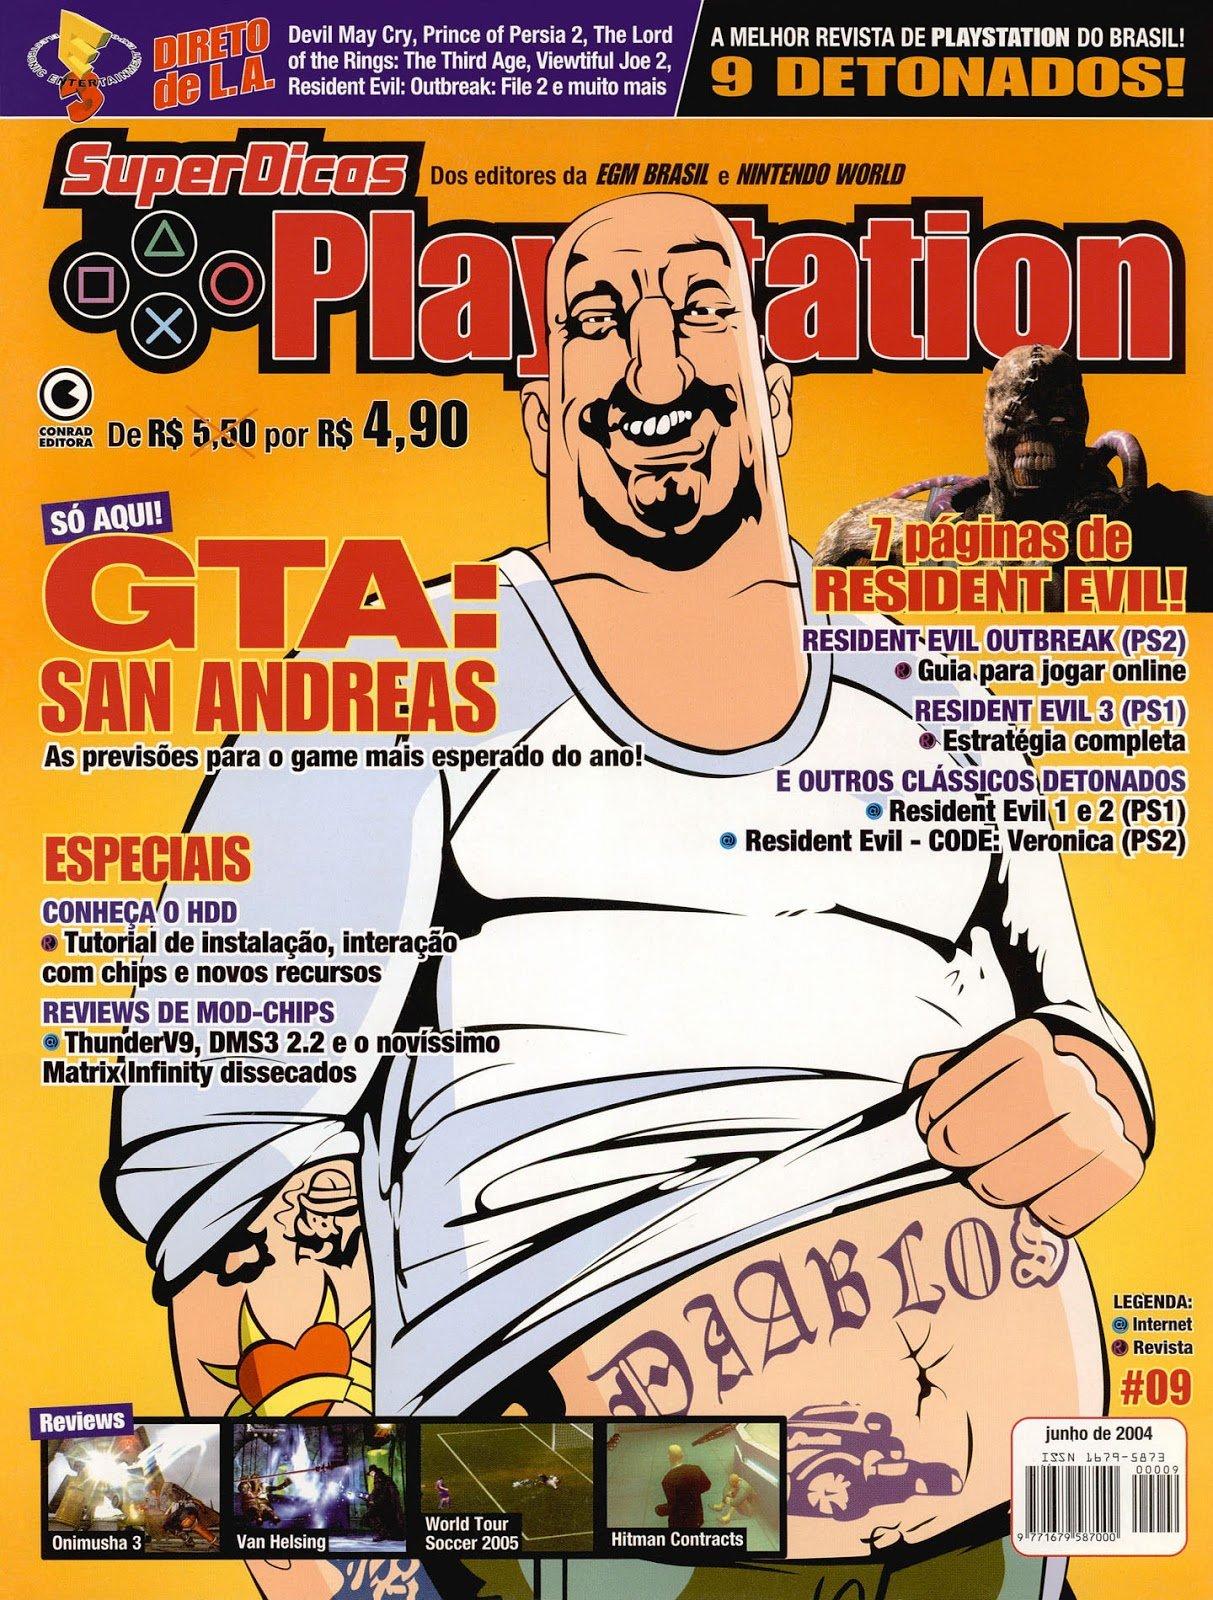 Super Dicas Playstation 09 (June 2004)